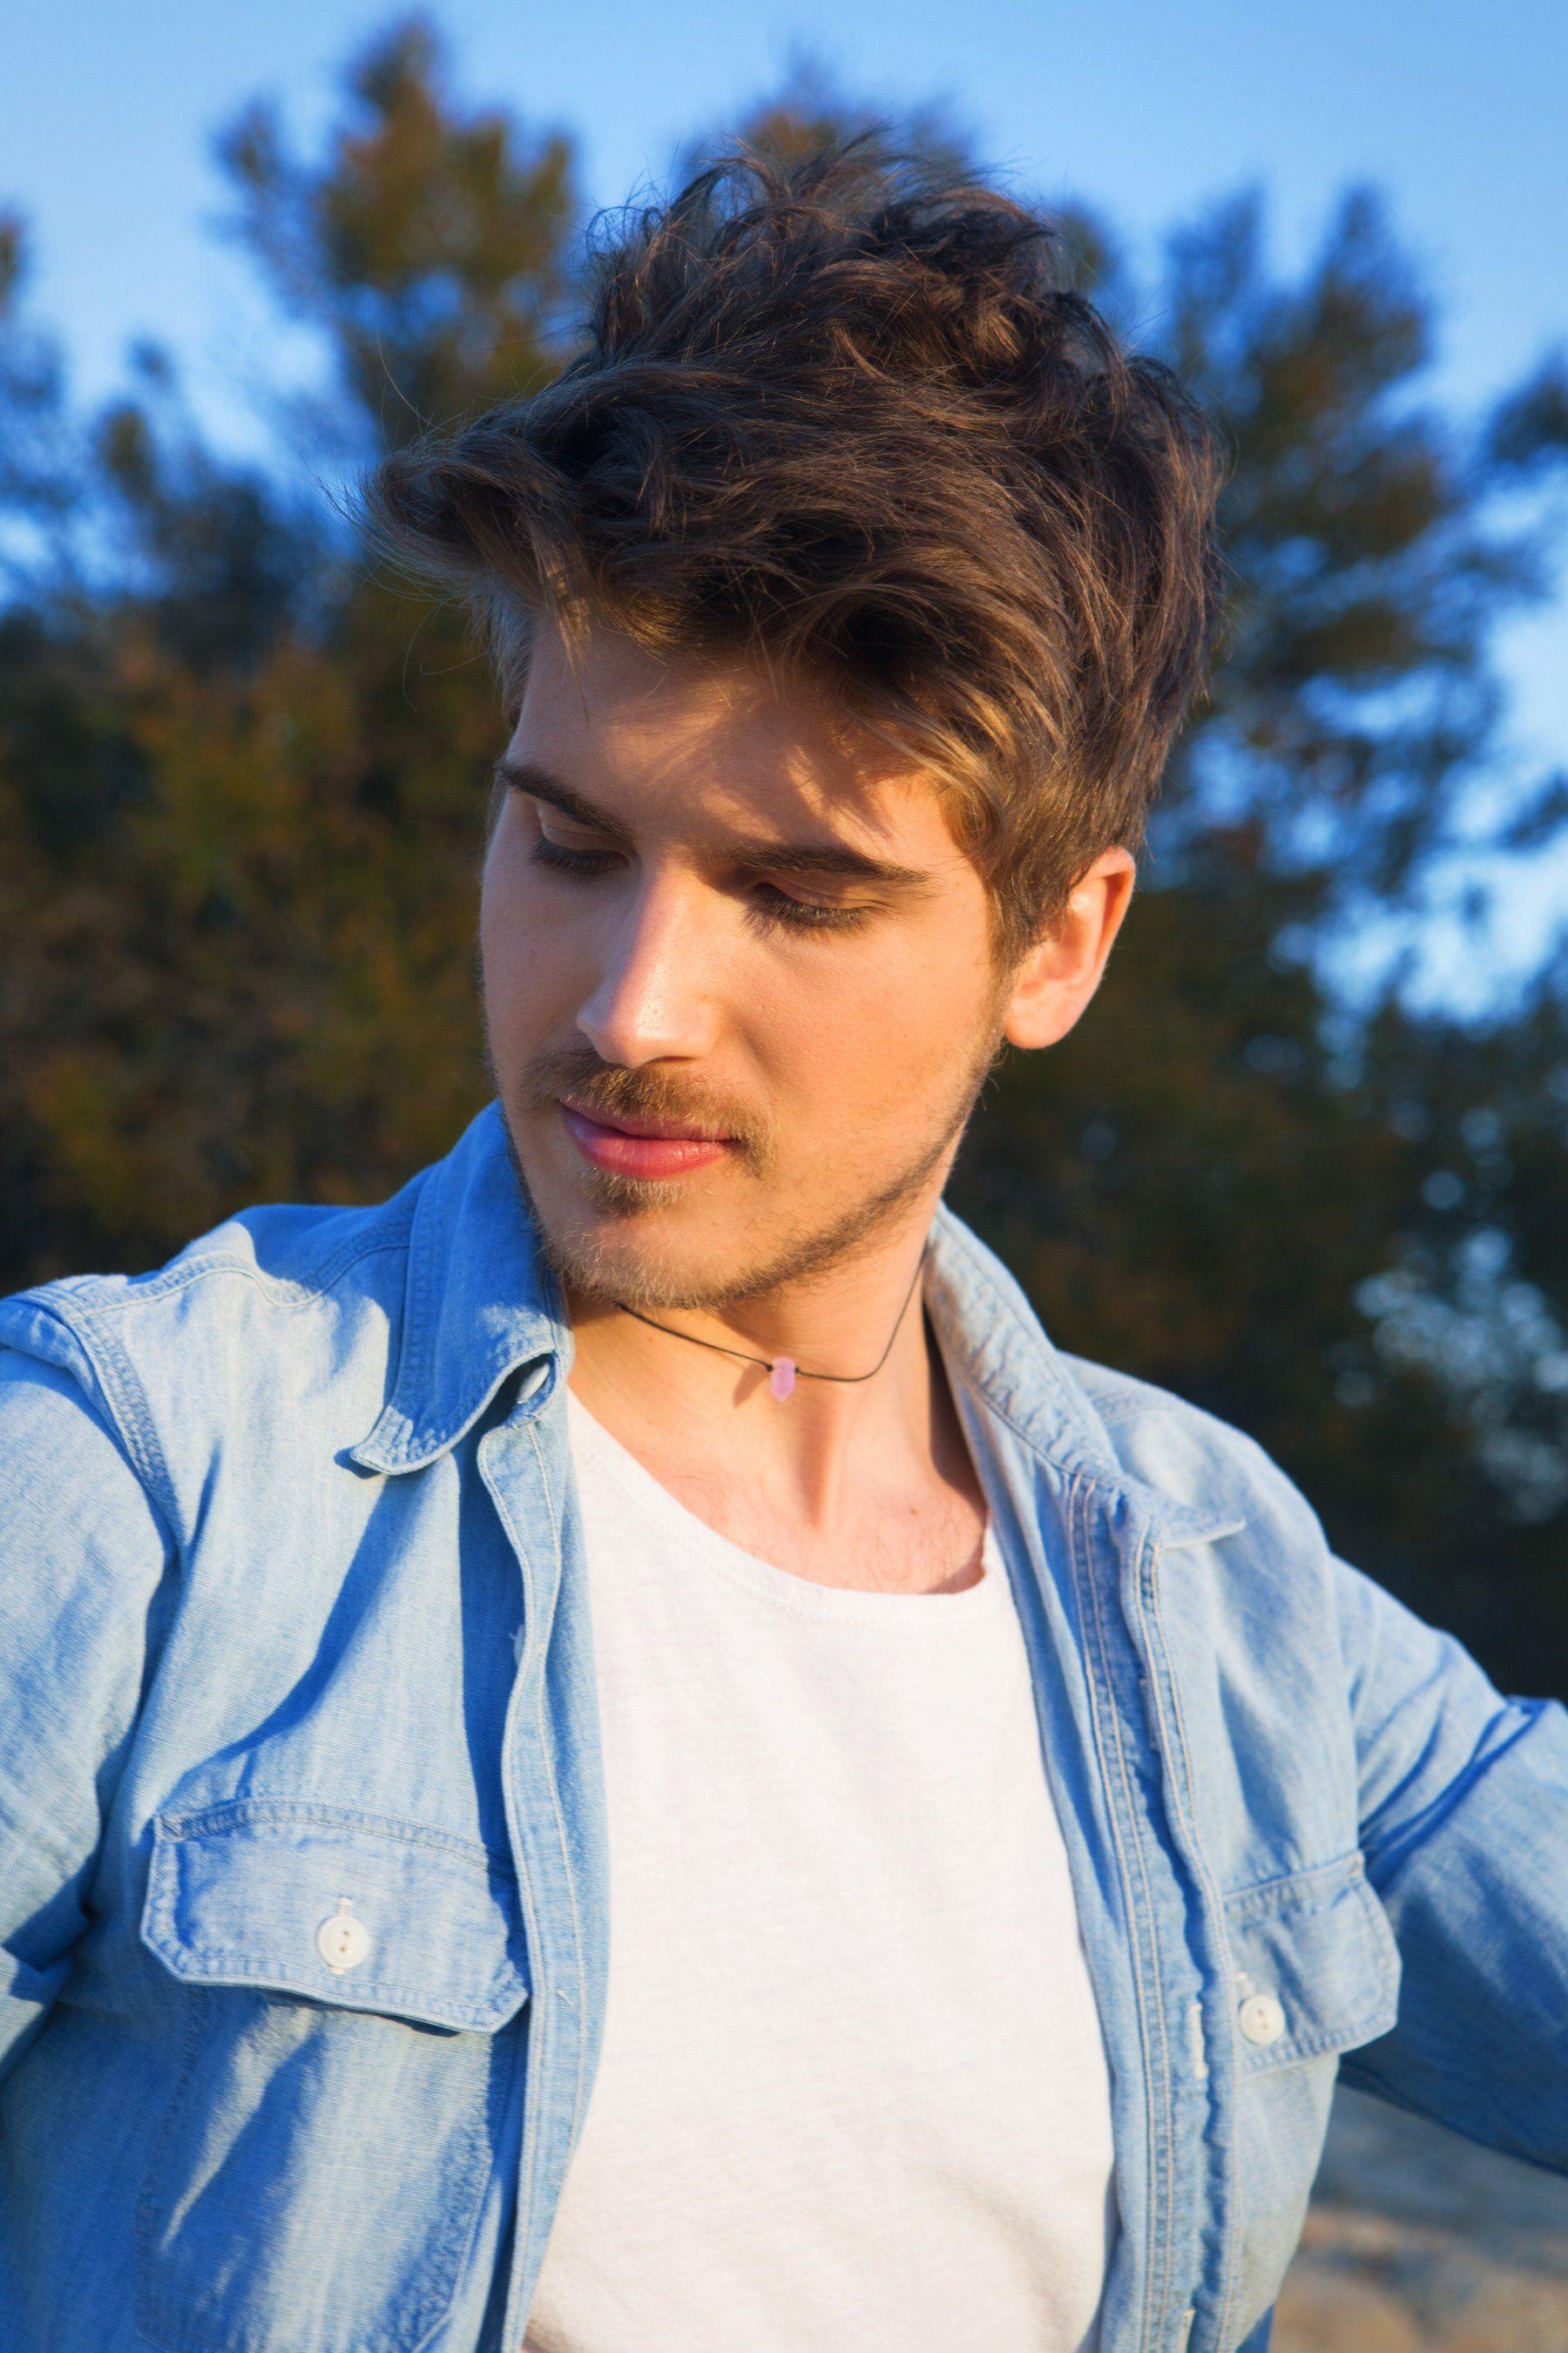 How Iconic Joey Graceffa Pinterest Joey Graceffa Shane Dawson